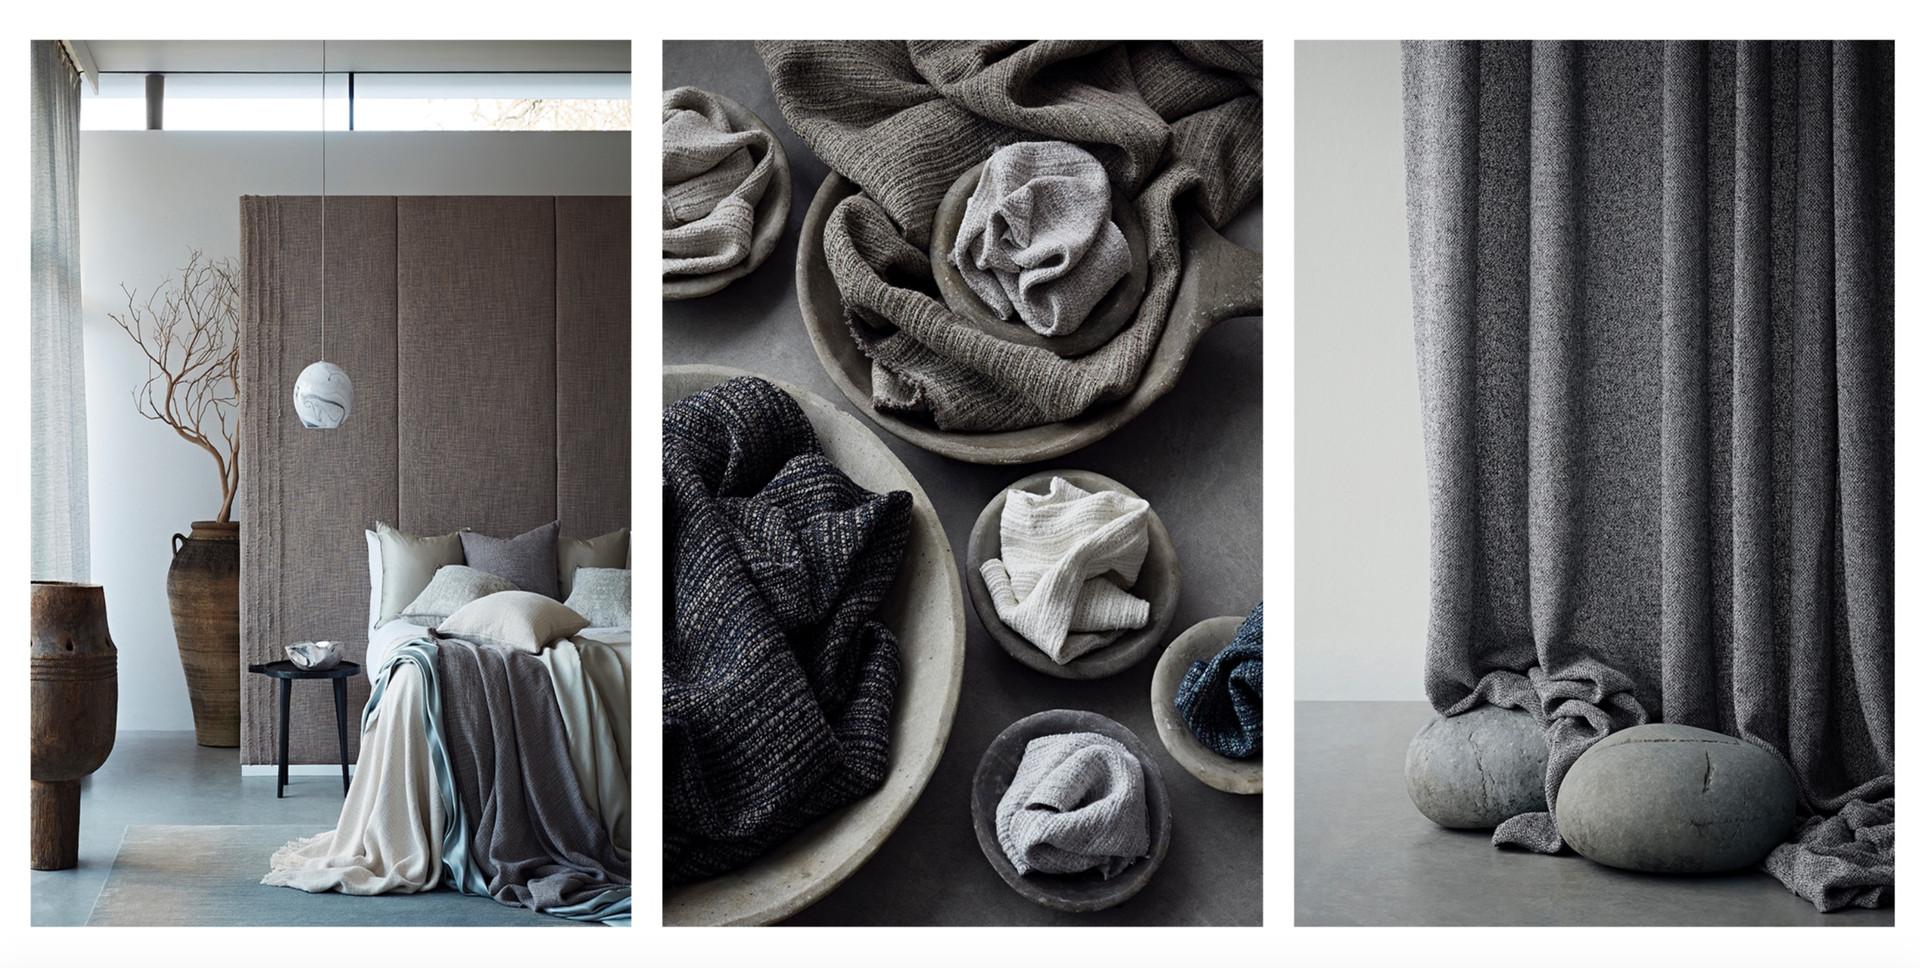 Atelier- Gordijnen - Textiel - Interieur - Stoffen - Meubels